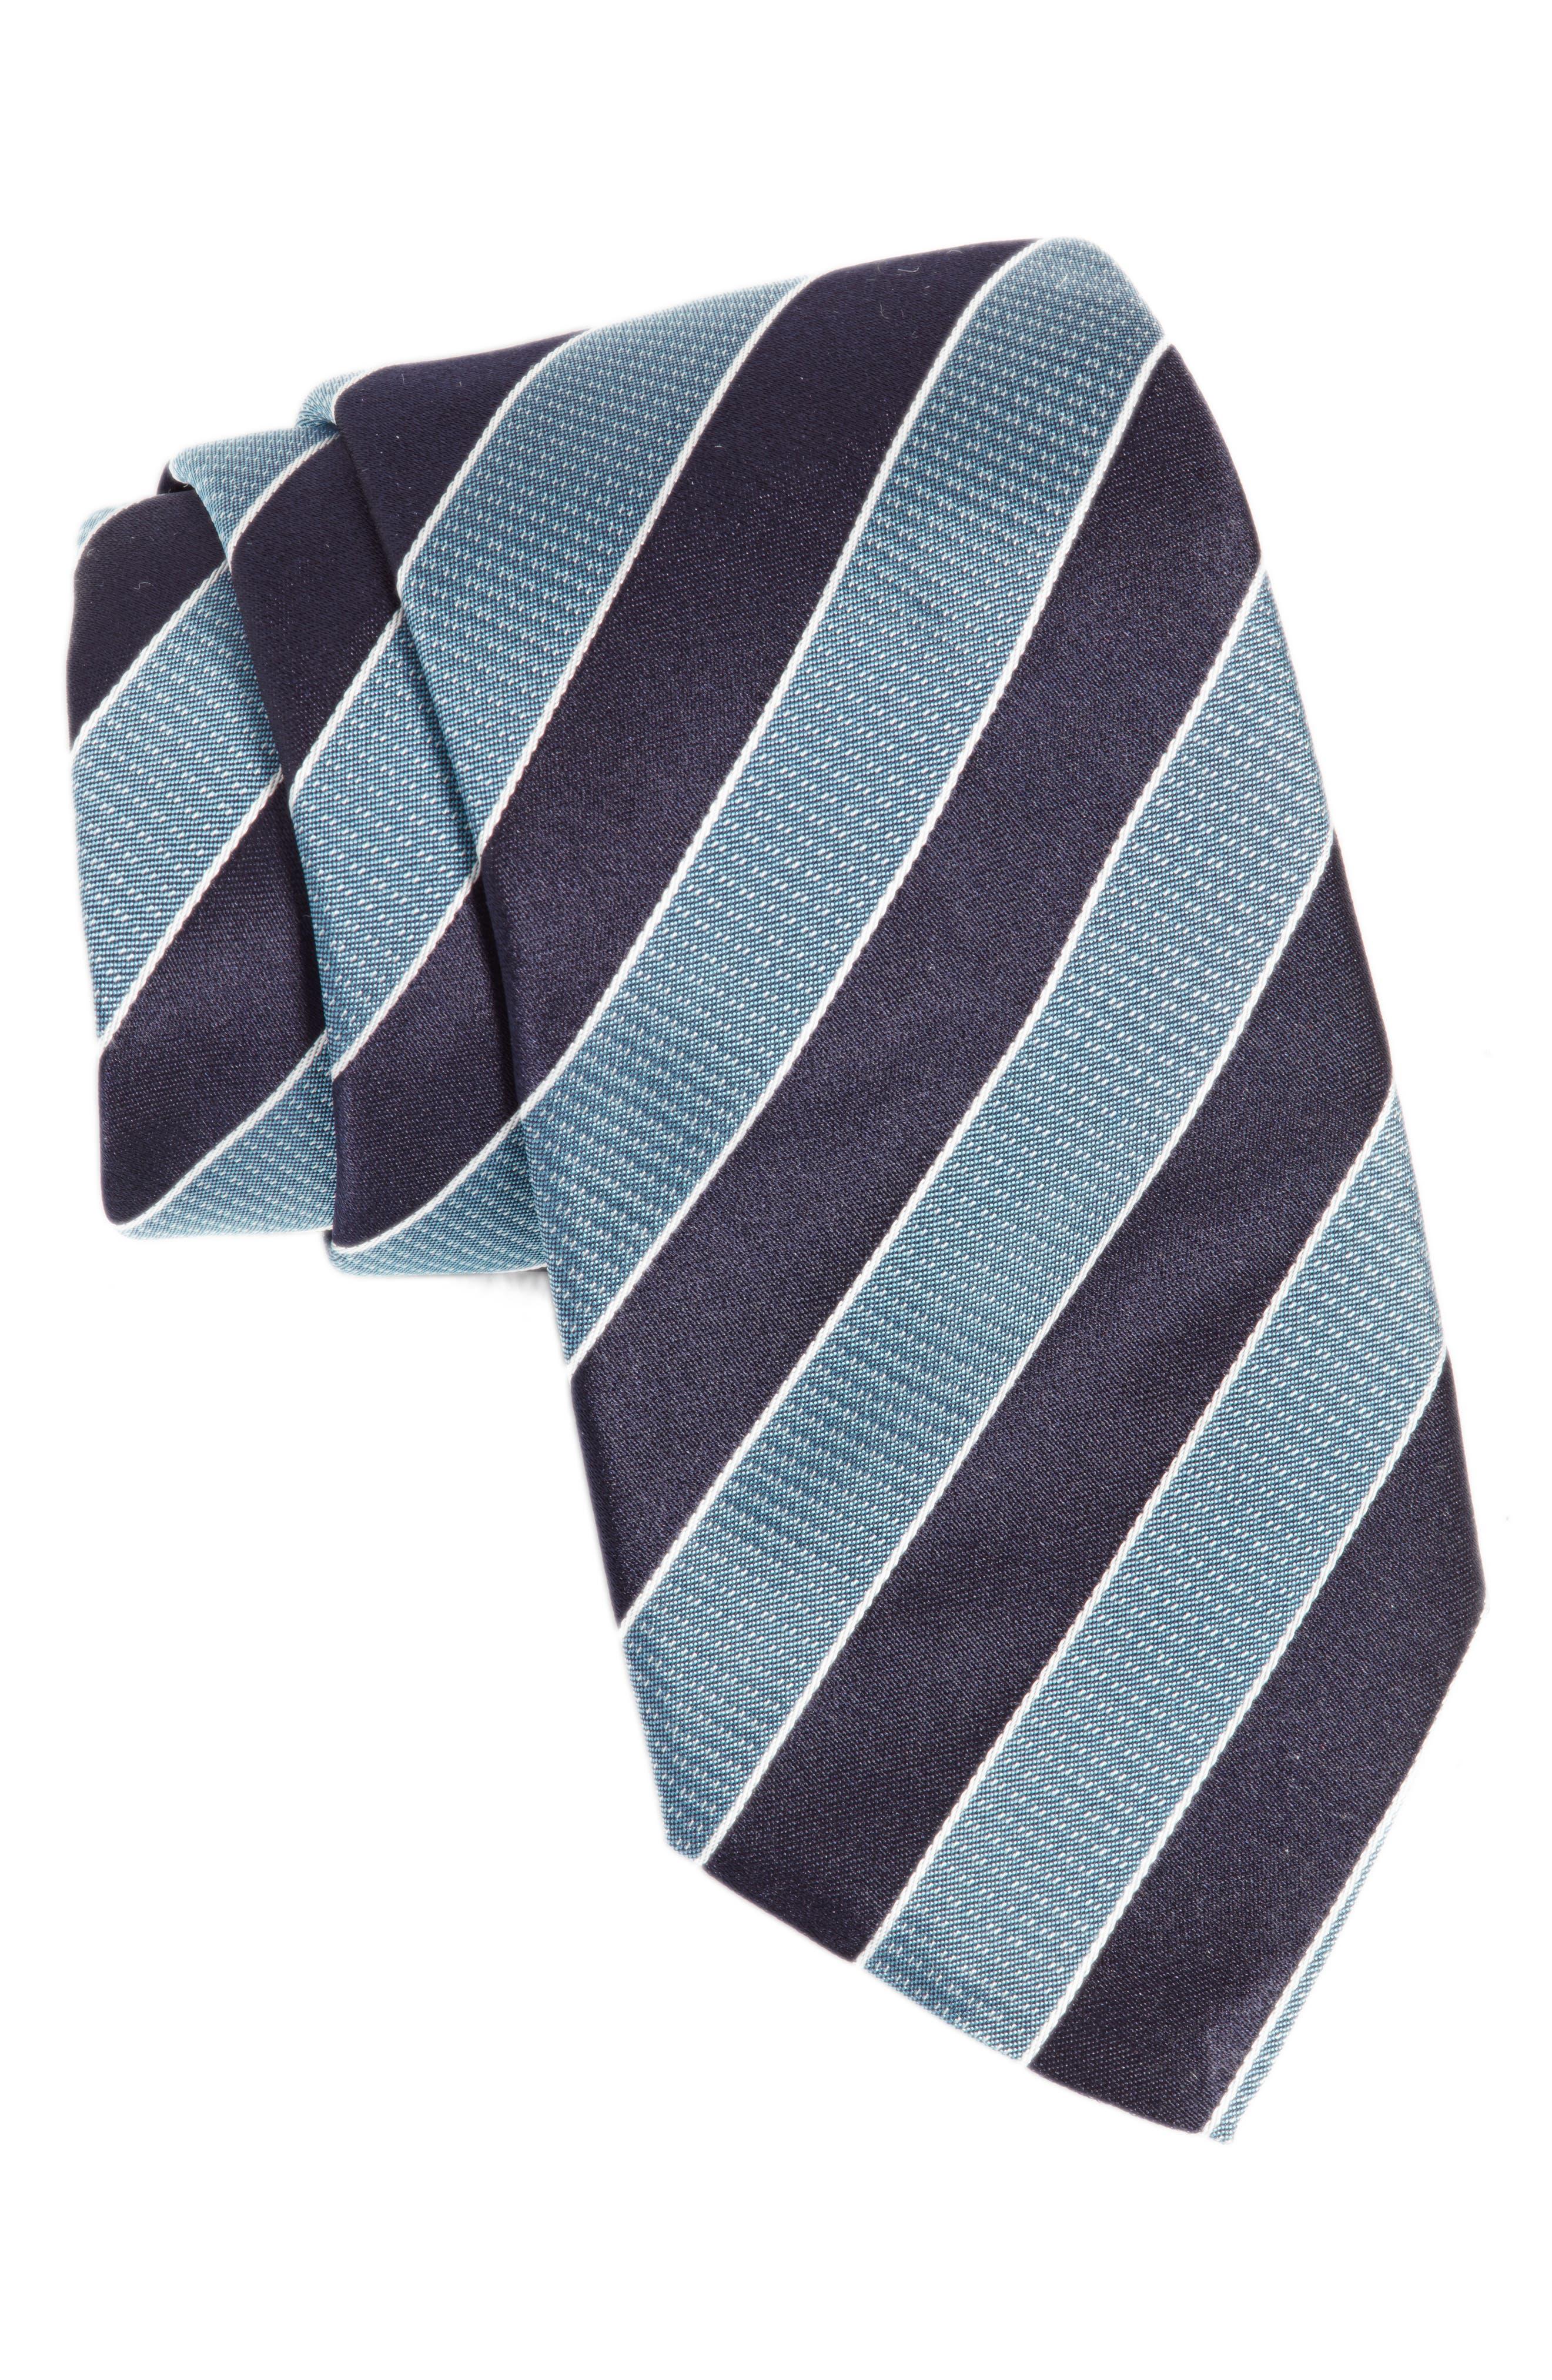 Alternate Image 1 Selected - BOSS Stripe Silk Tie